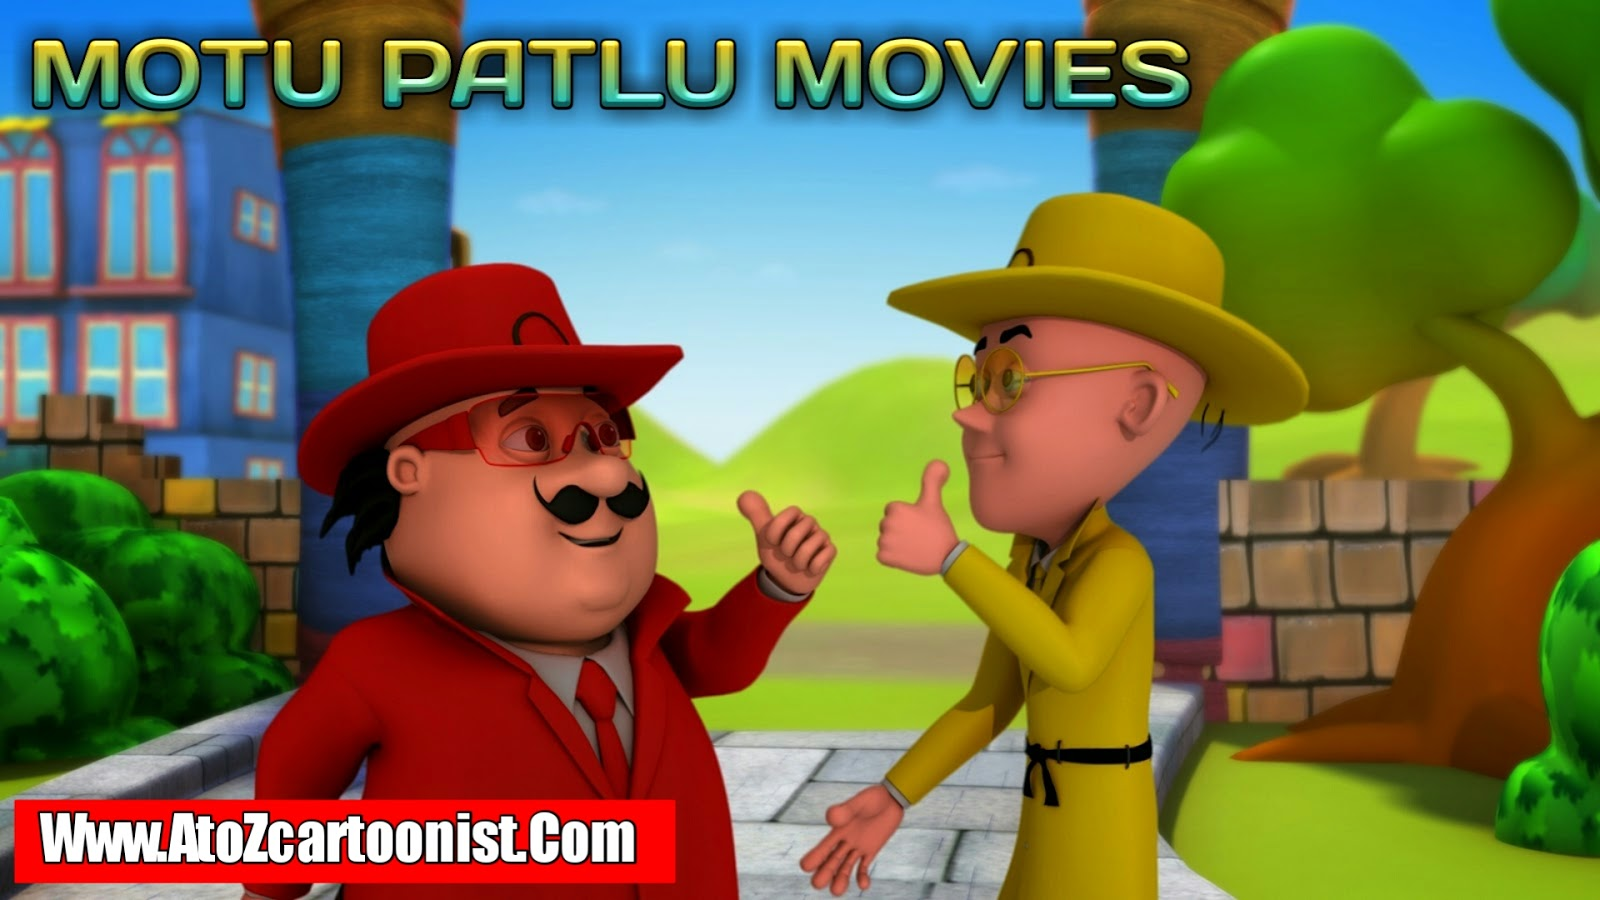 MOTU PATLU ALL MOVIES ACCORDING TO HINDI RELEASE HD DOWNLOAD/WATCH ONLINE